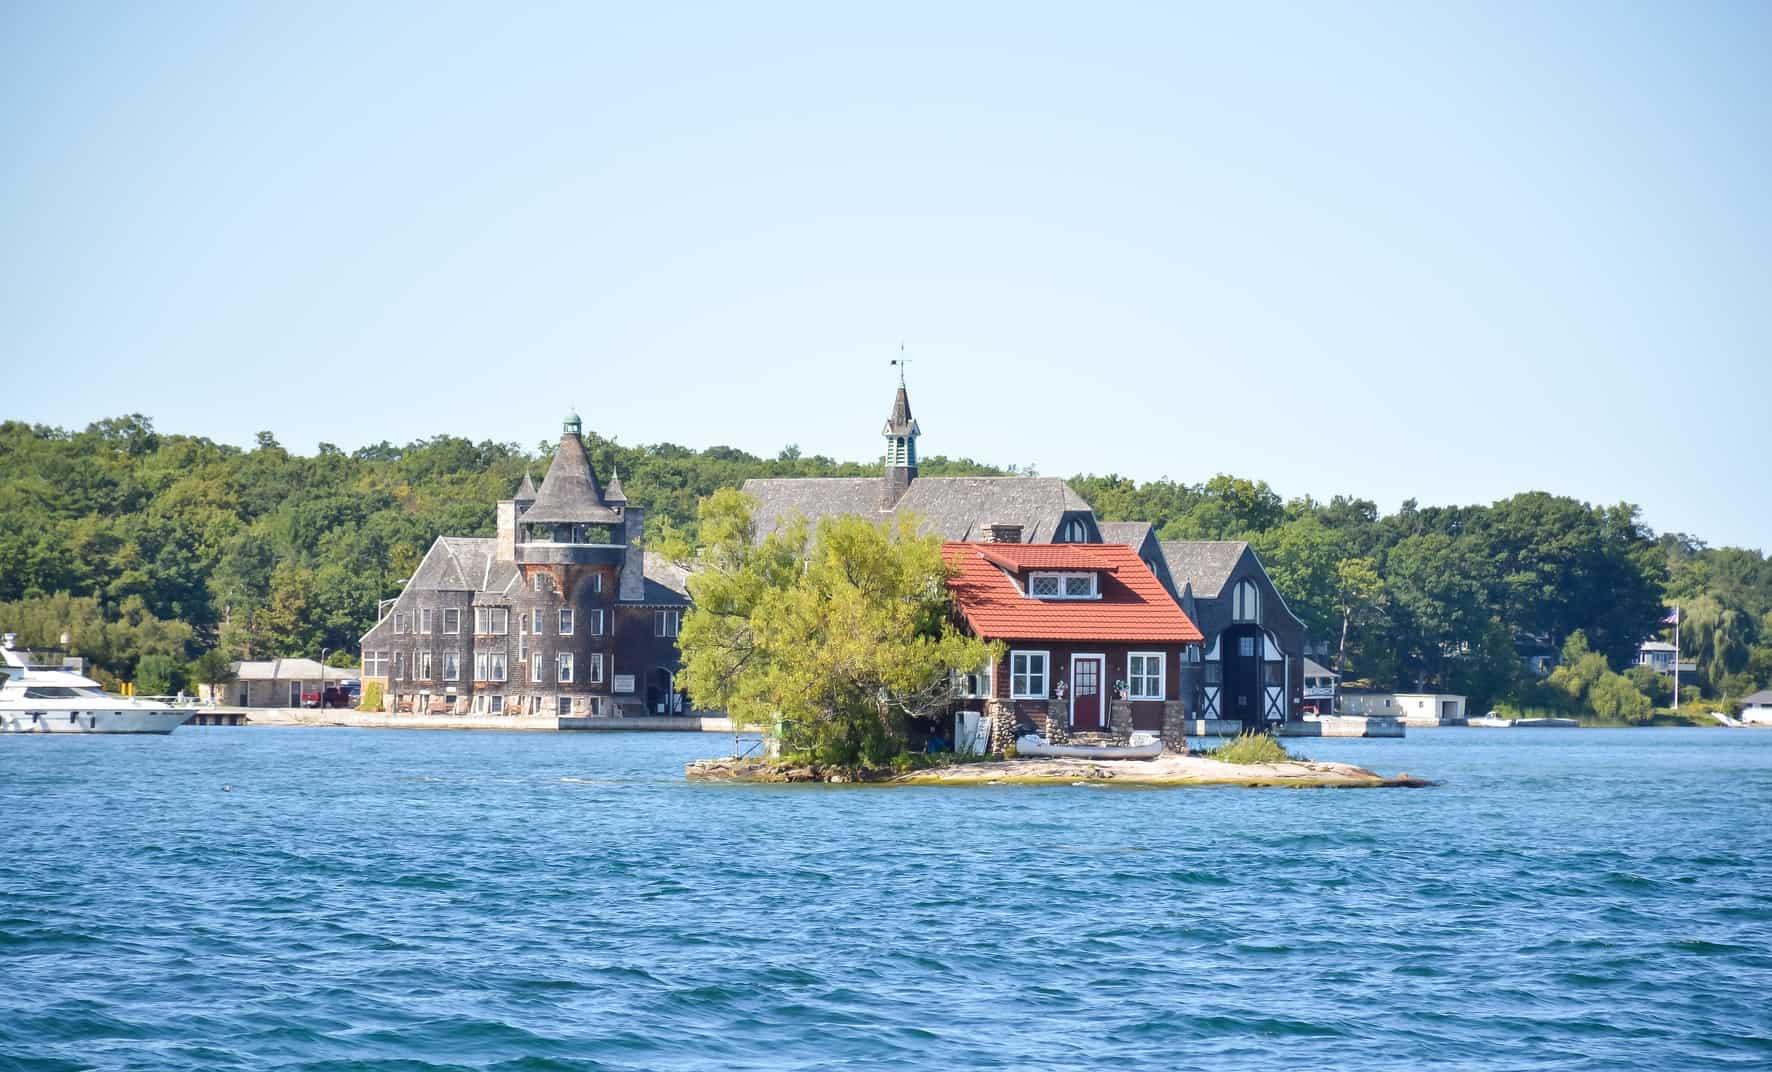 1000 Islands and Kingston Ontario, Canada